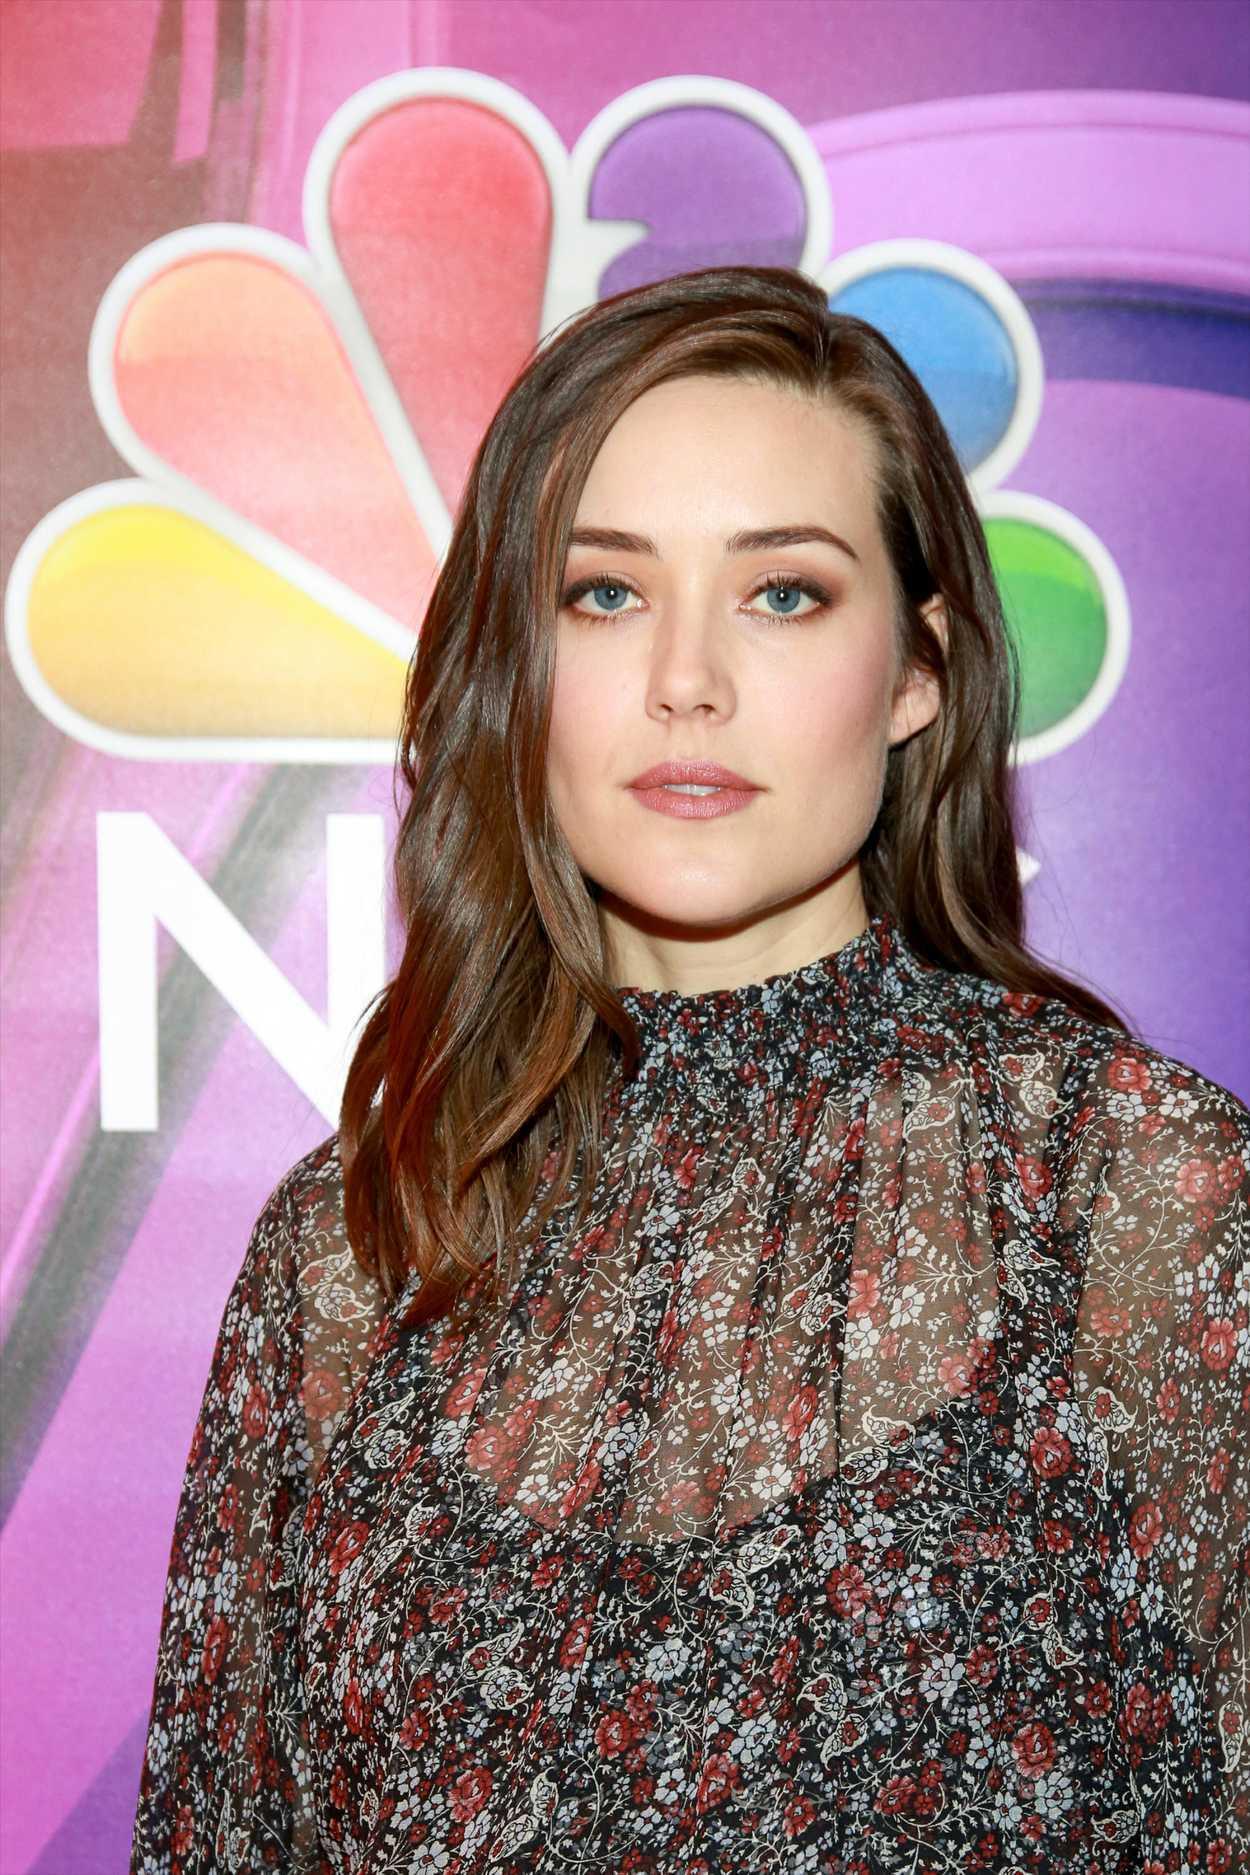 Megan Boone Attends NBCs NY Mid Season Press Junket in